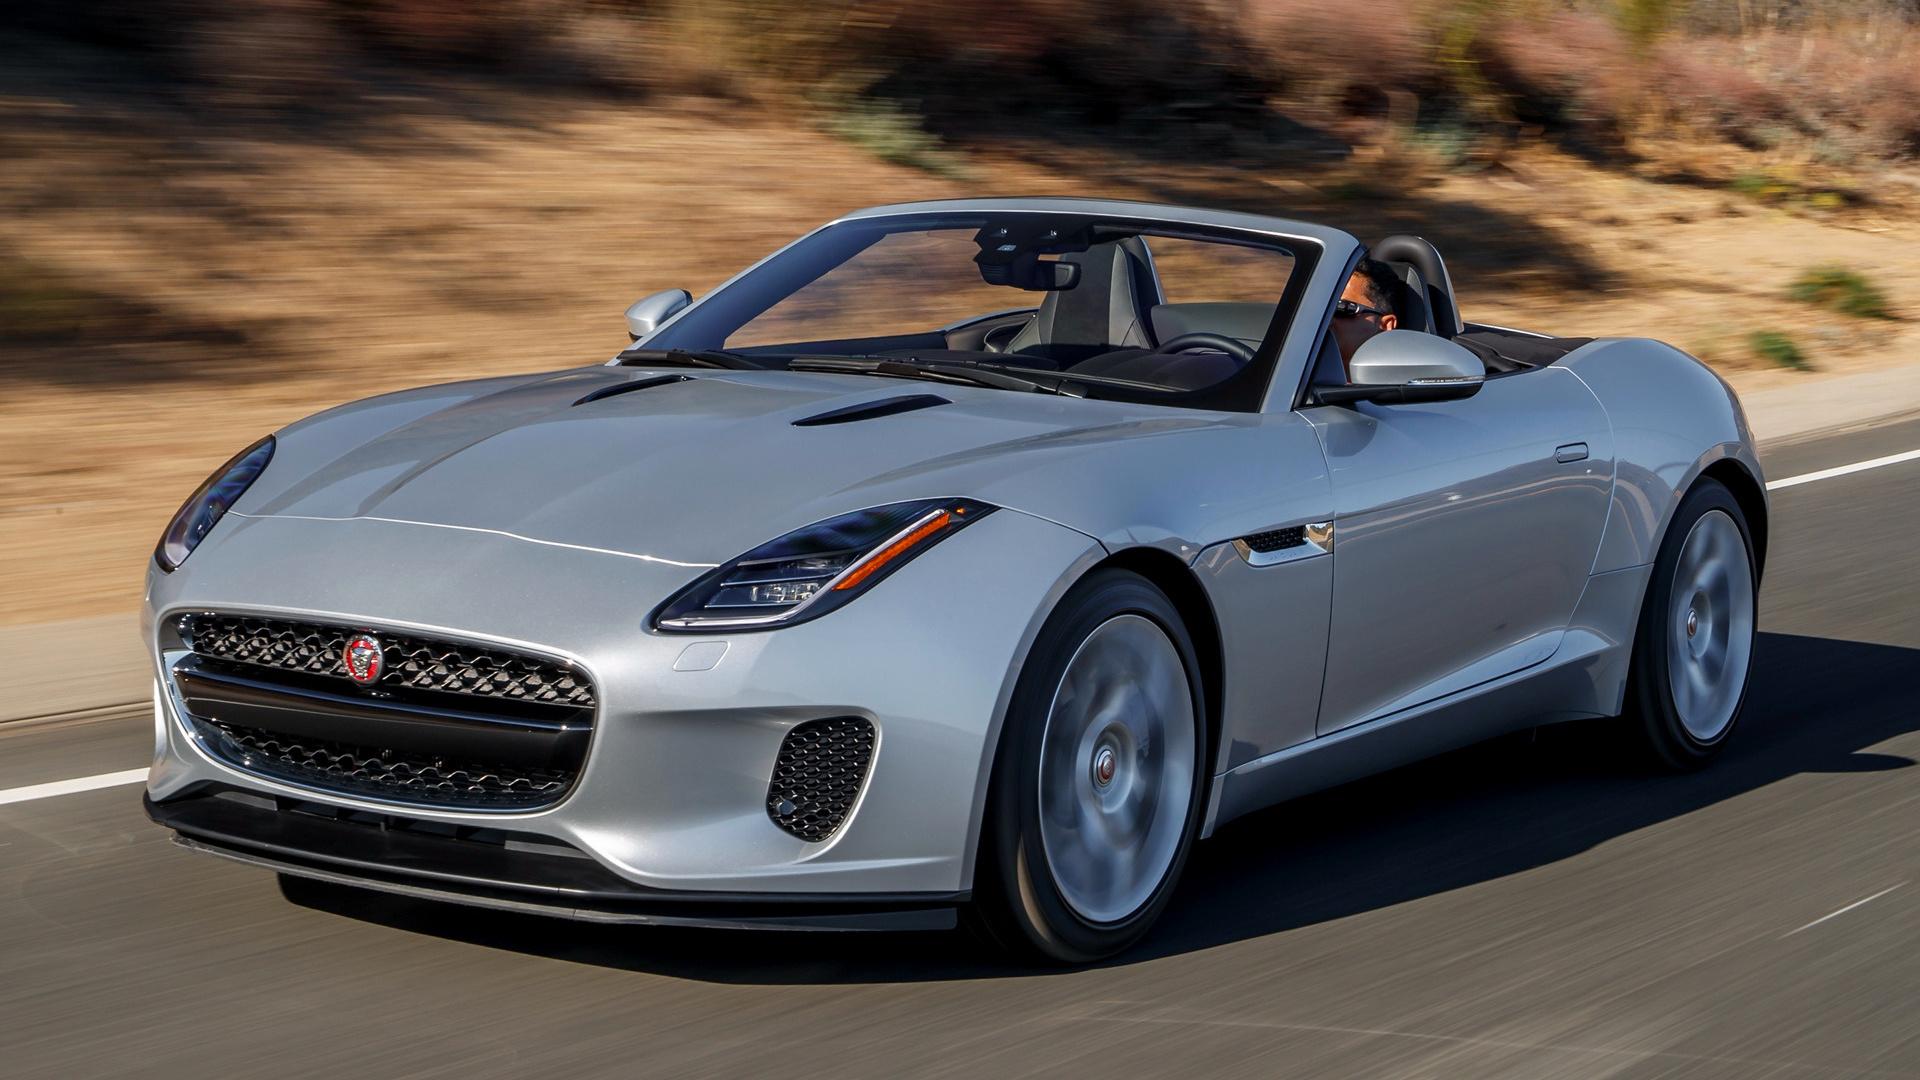 Jaguar F Type Coupe >> 2018 Jaguar F-Type Convertible (US) - Wallpapers and HD ...